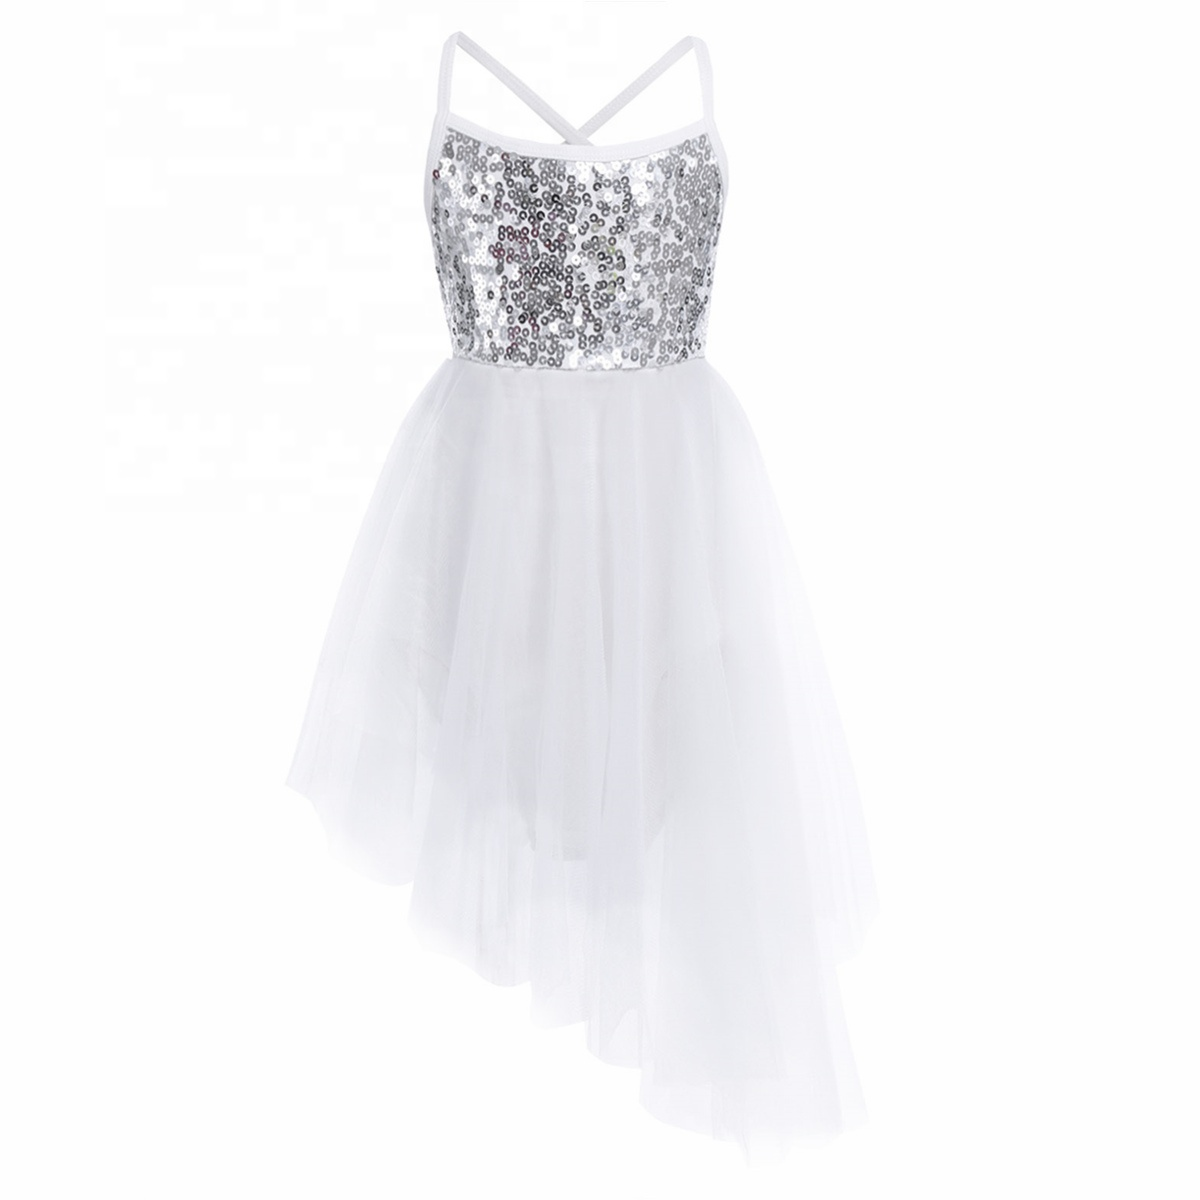 Girls Ballet Latin Dance Dress Kids Gymnastics Sparkle Leotard Dancewear Costume